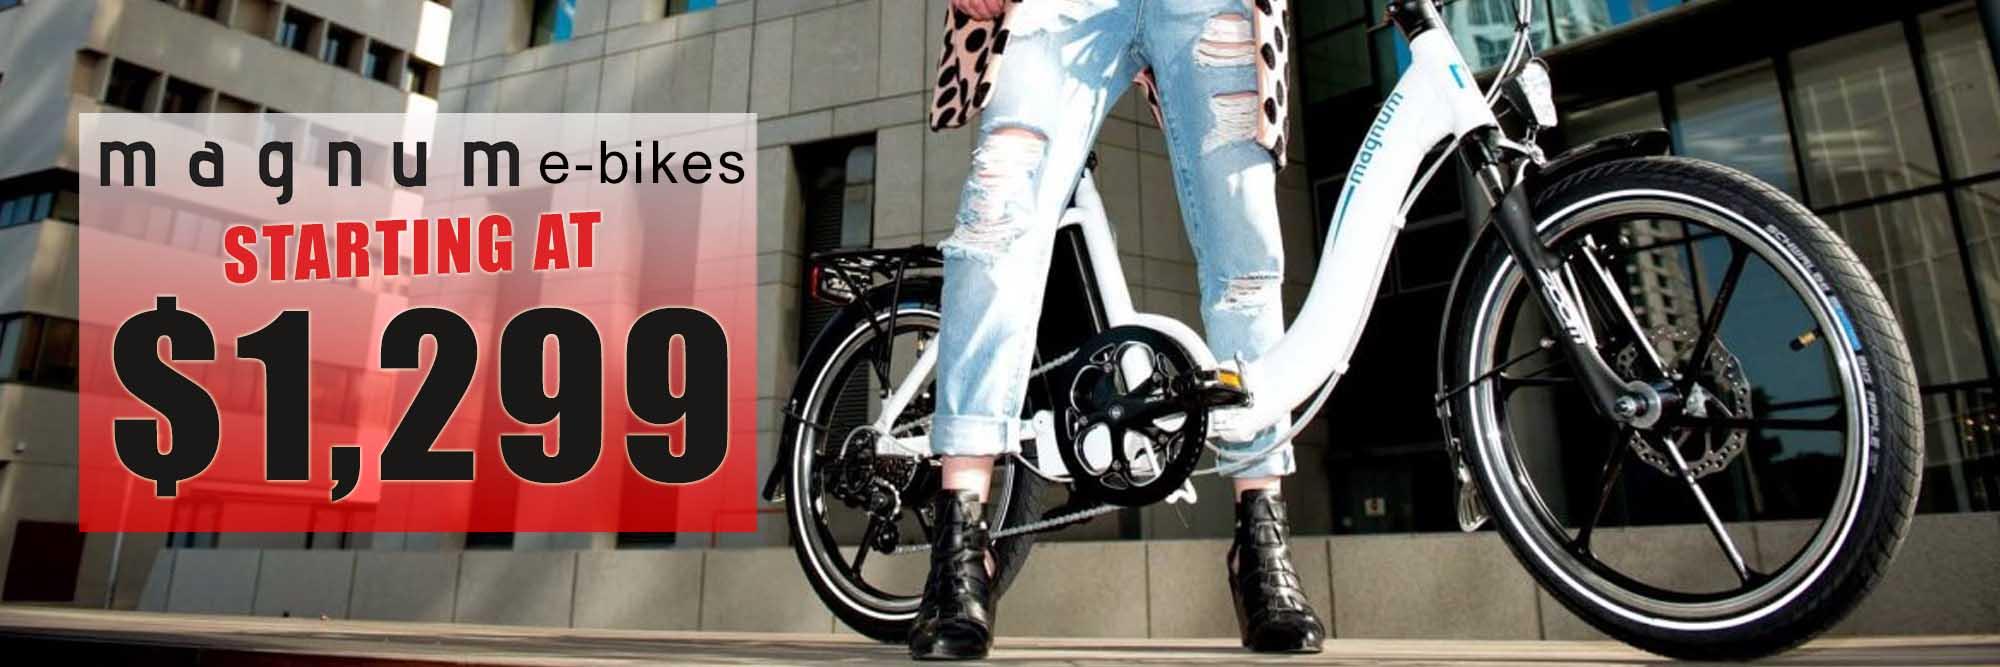 Magnum Electric Bikes - Starting at $1,299.99